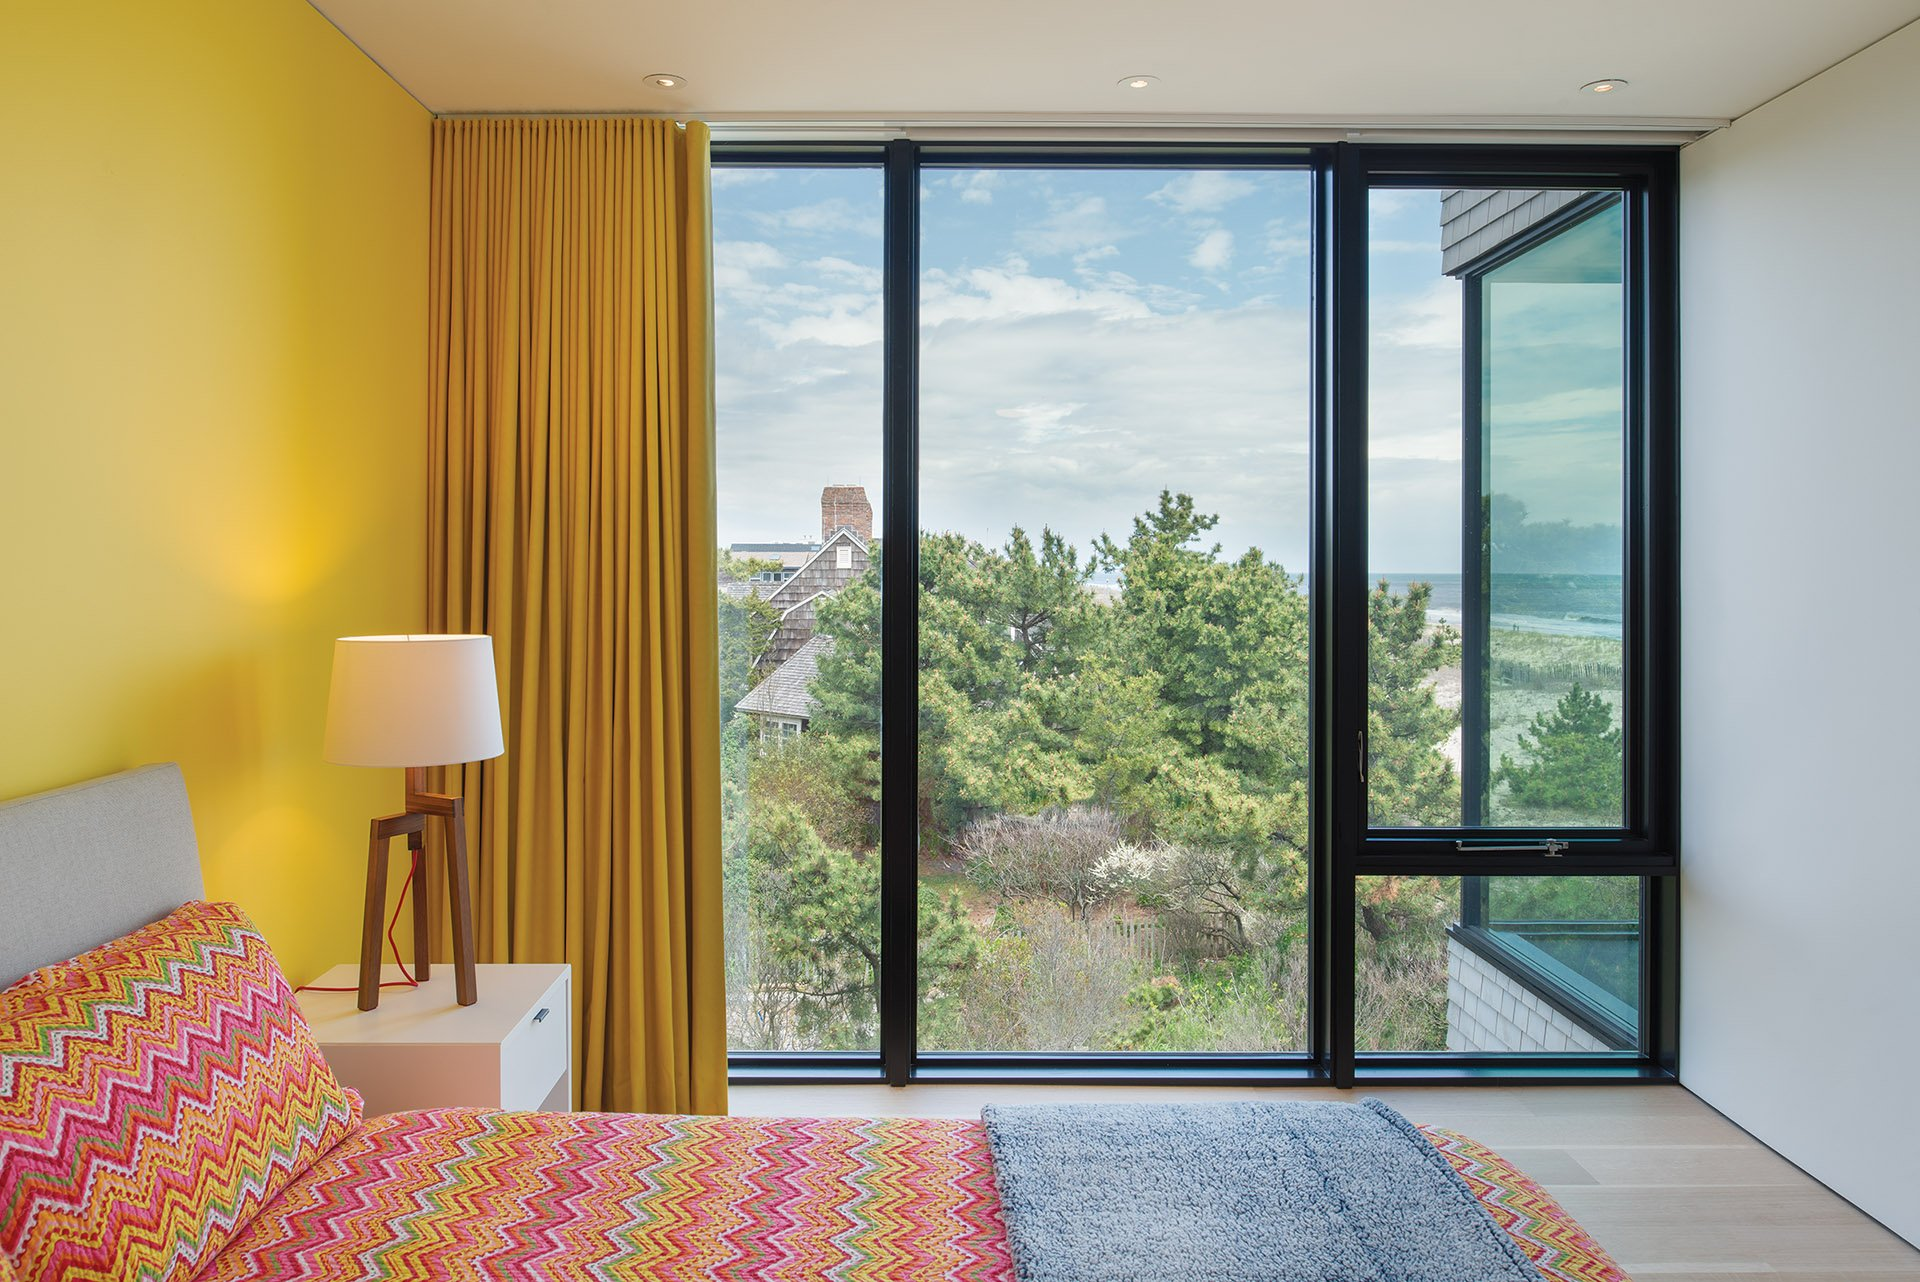 Sunny walls and drapery animate a bedroom.